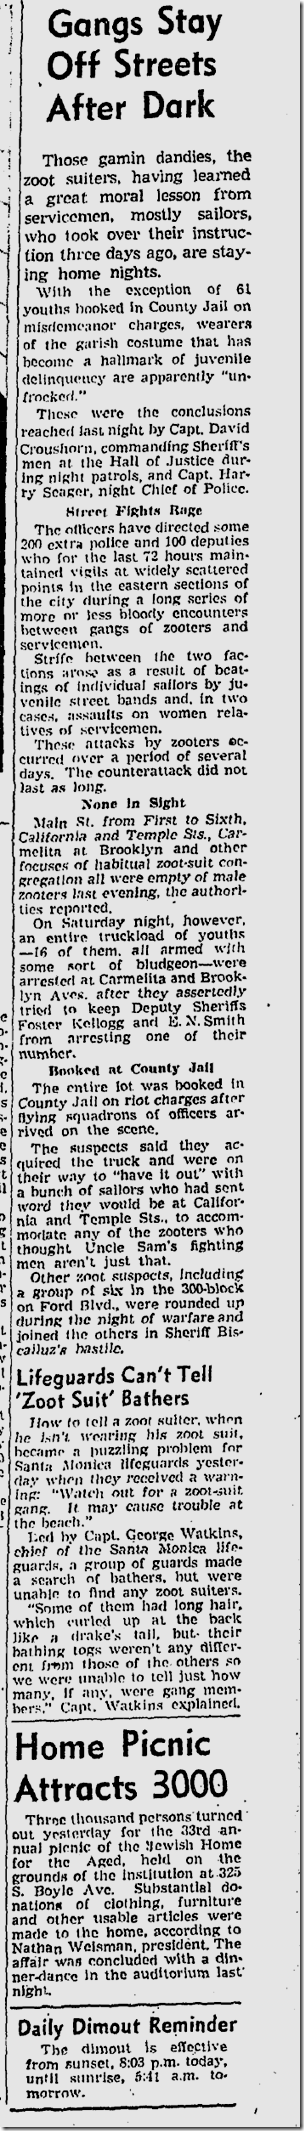 June 7, 1943, Zoot Suits